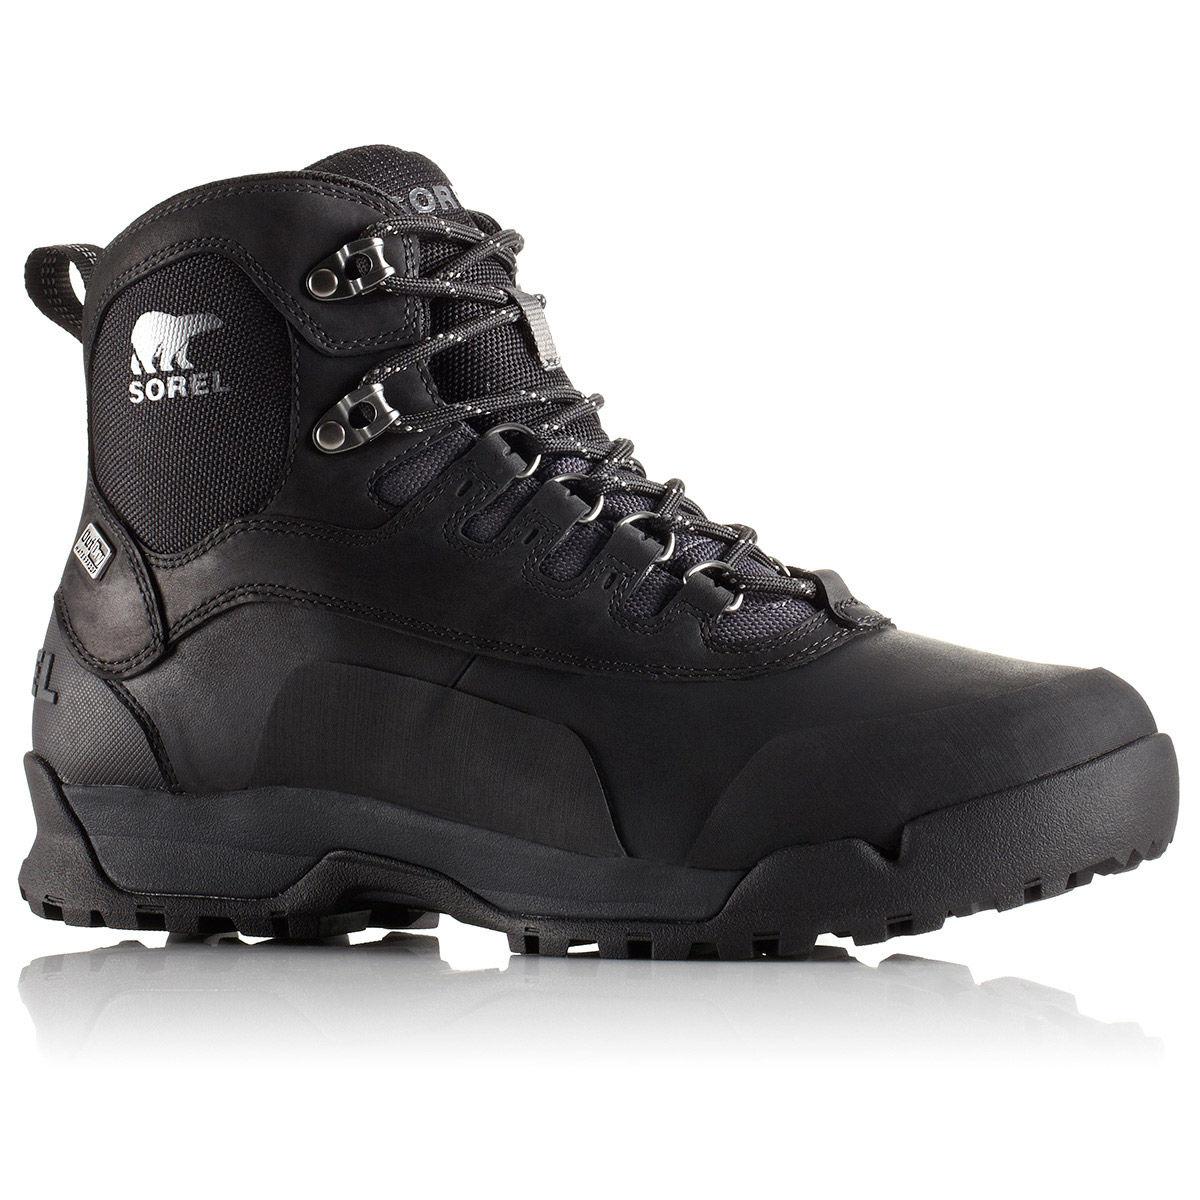 Sorel Paxson Mid Outdry Boots